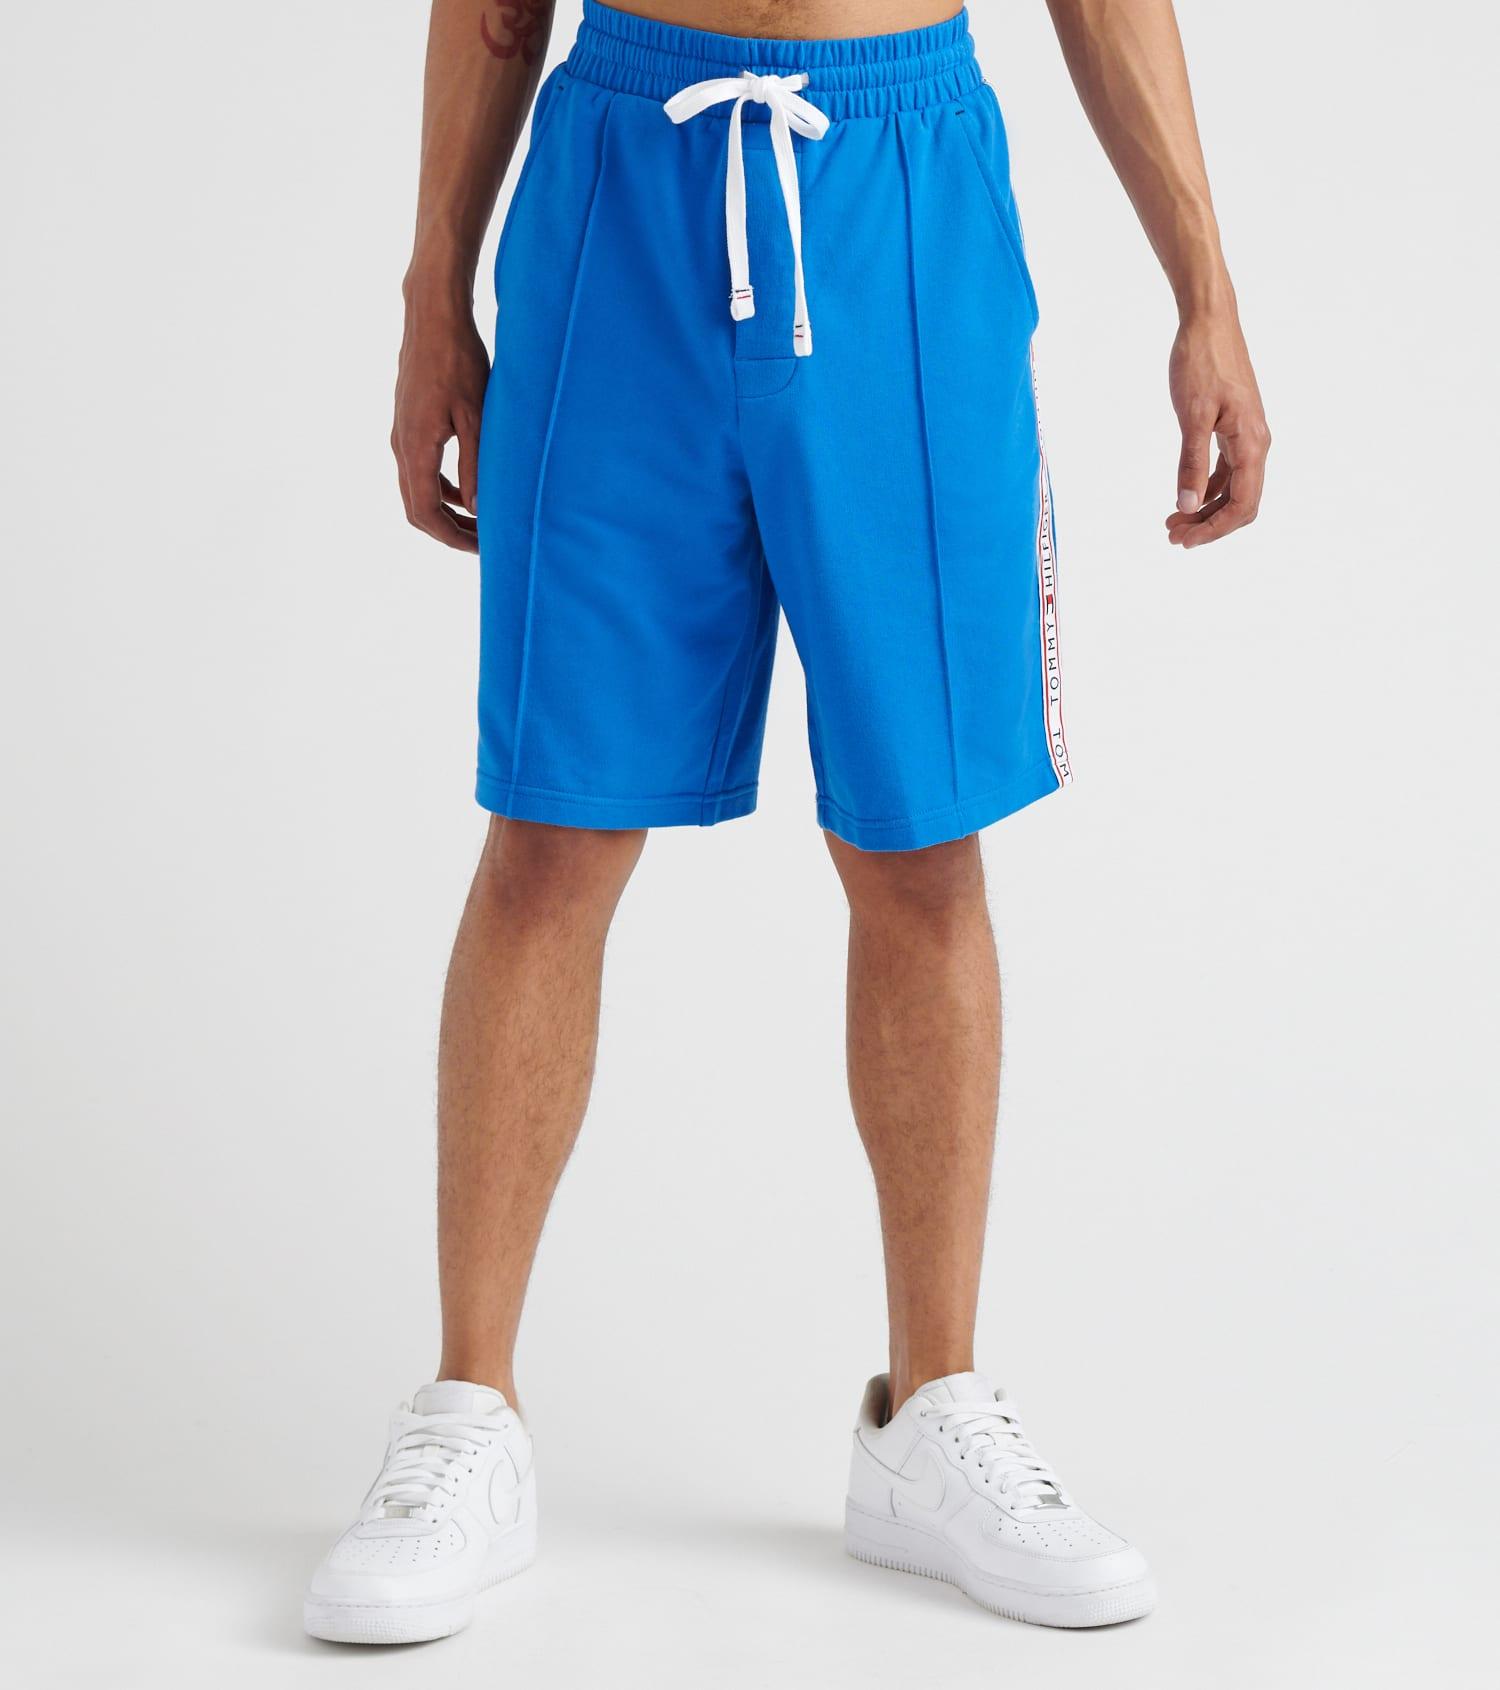 Tommy Hilfiger Grey Cotton Short